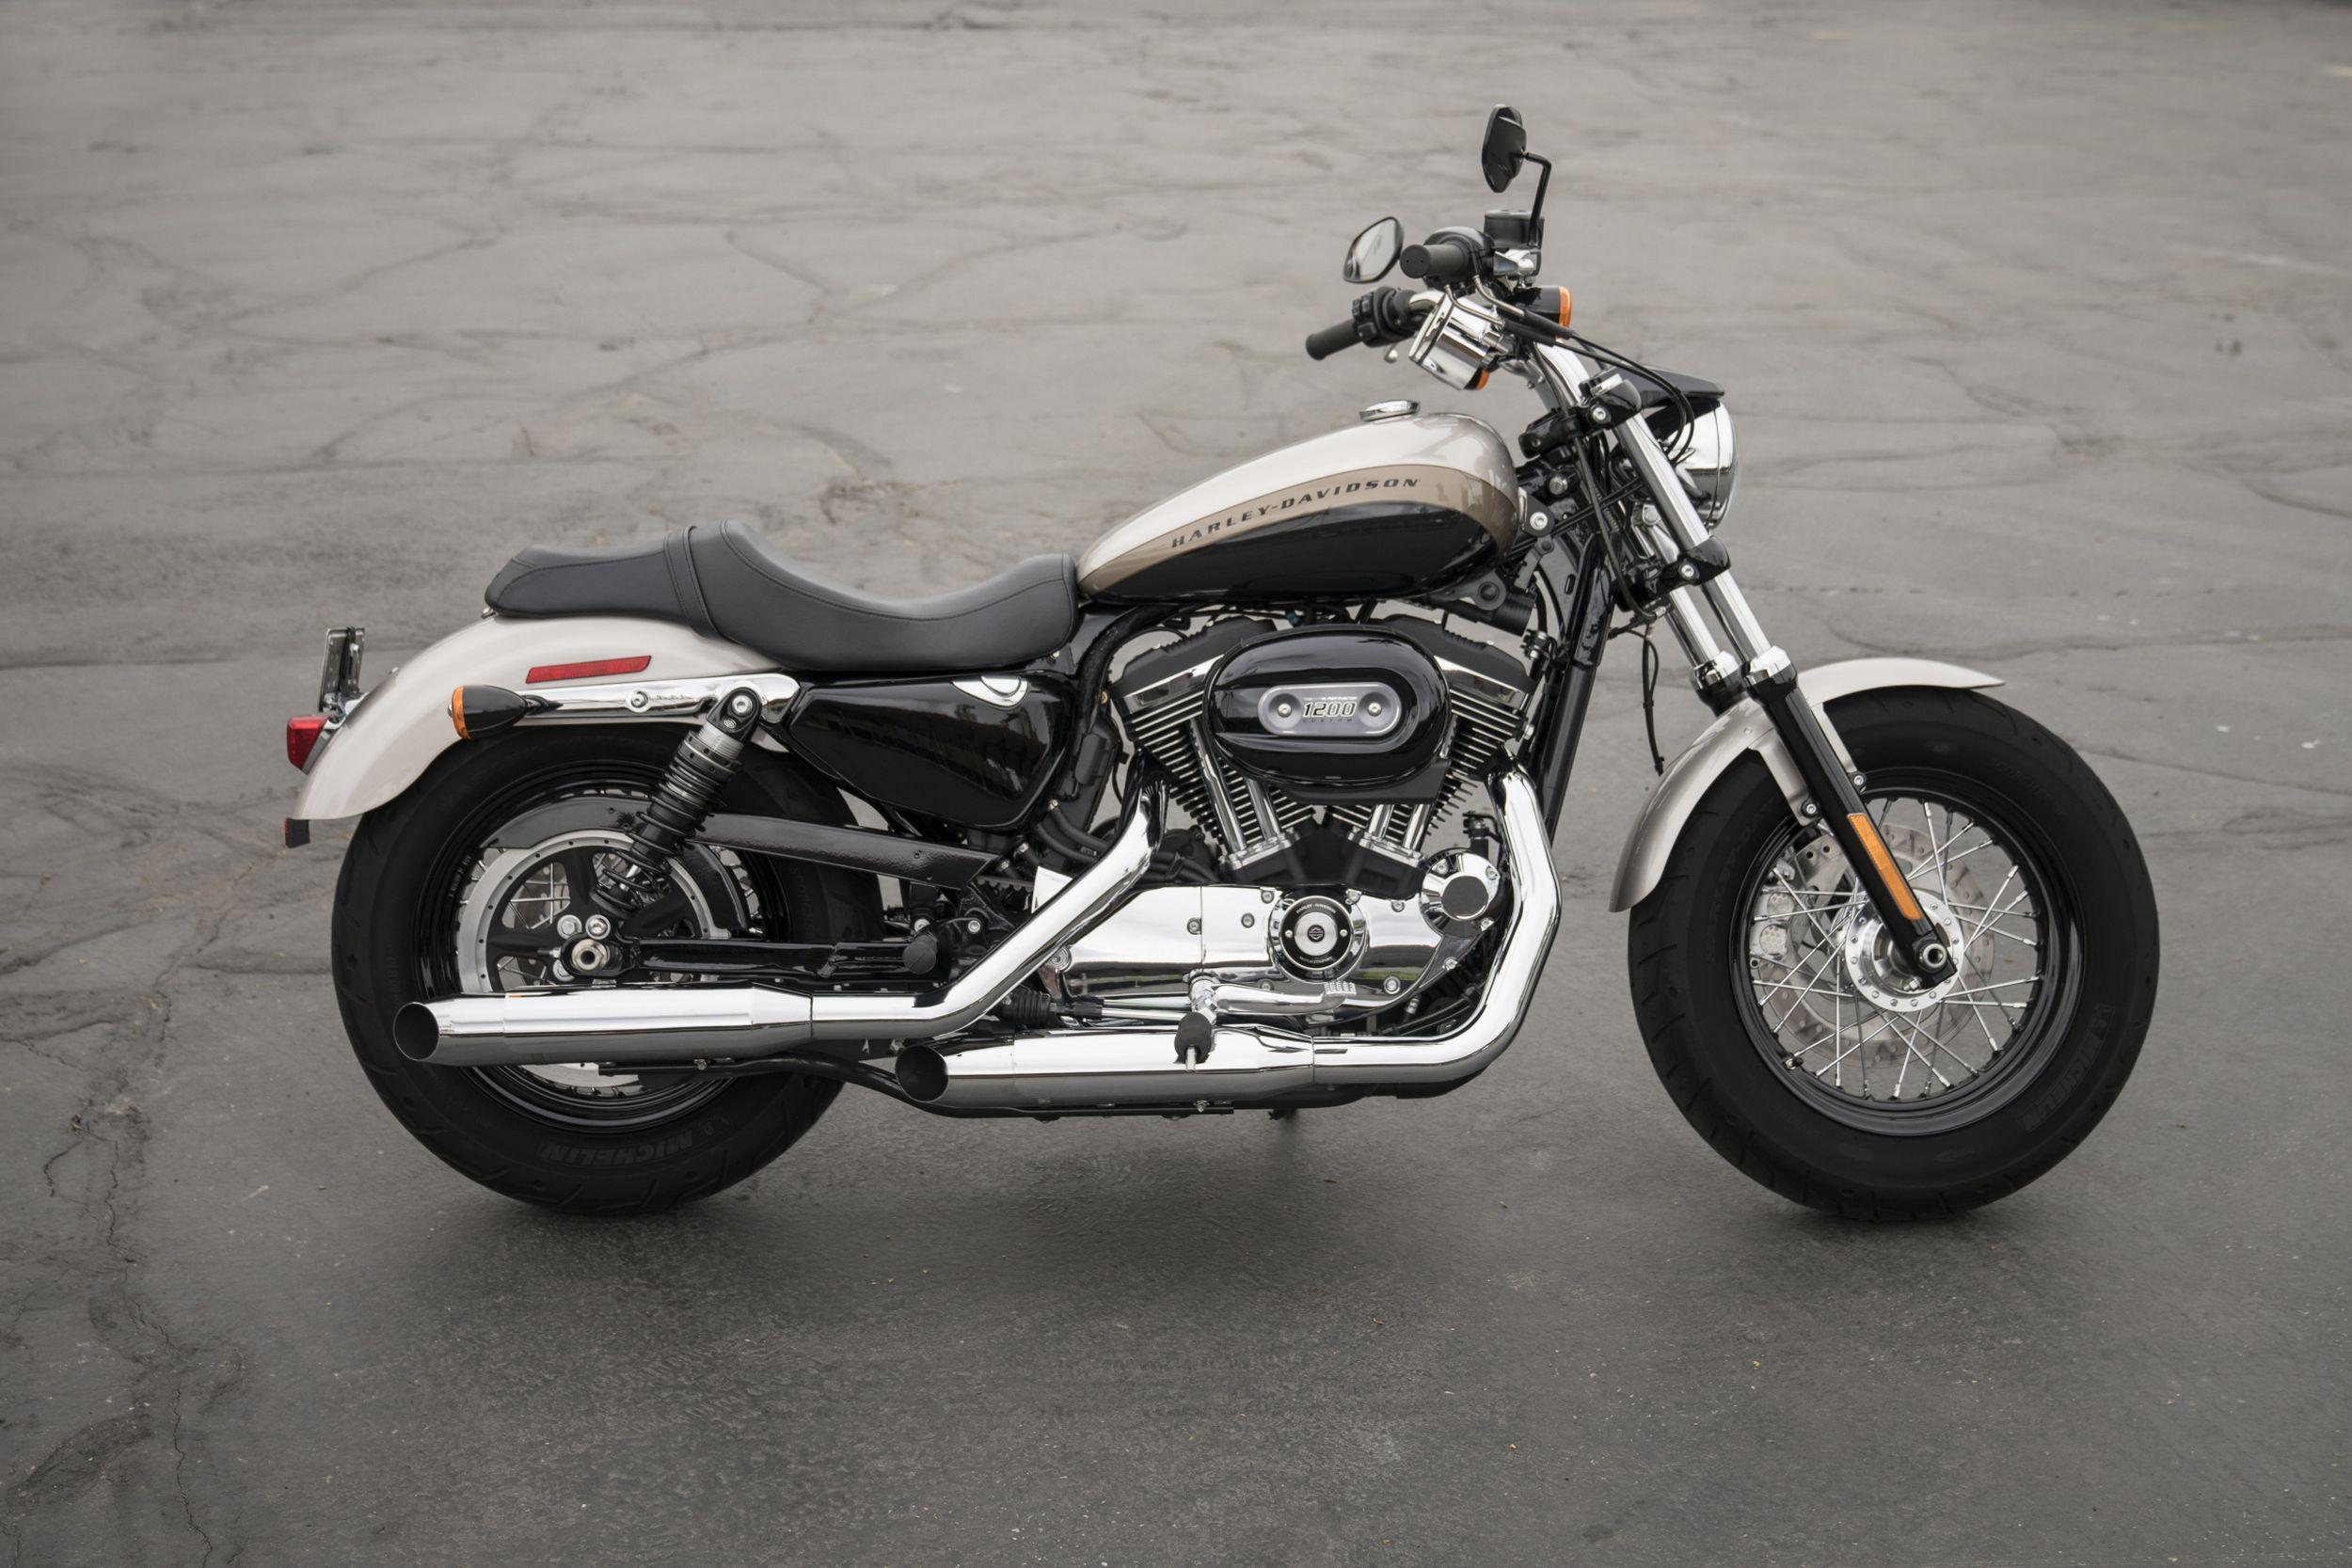 Elegant Harley Davidson 883 Specs